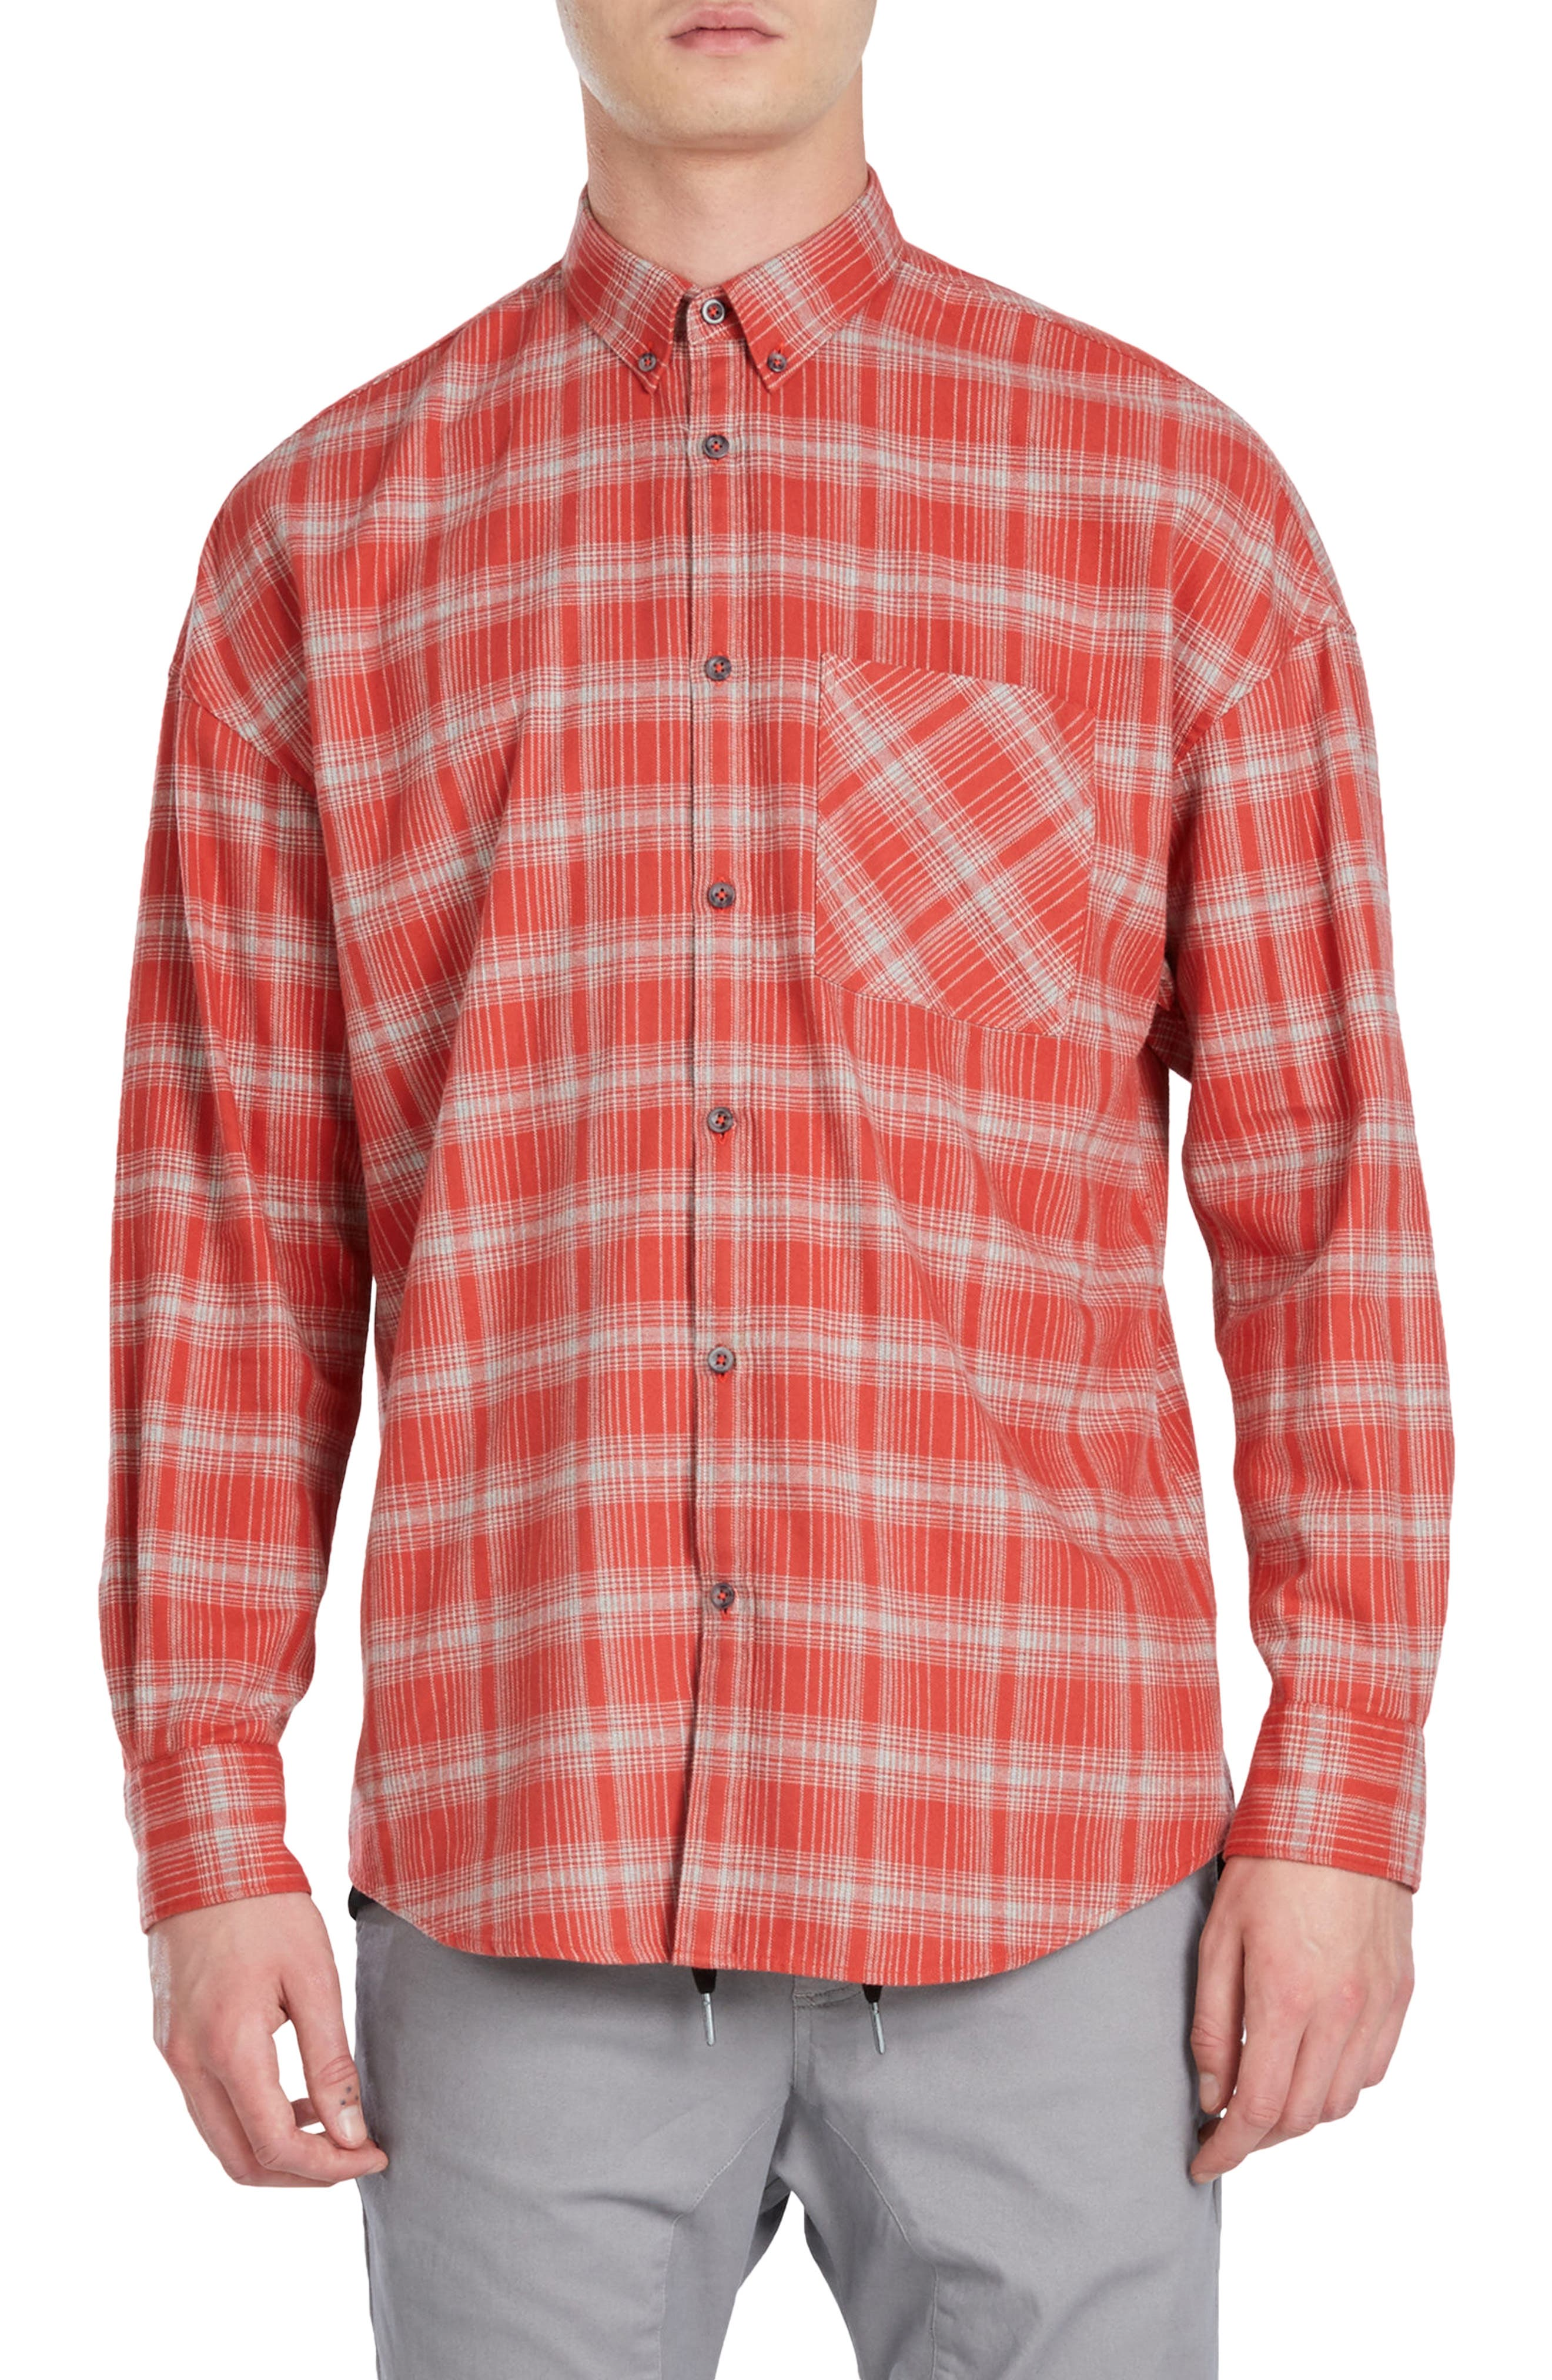 Rugger Plaid Sport Shirt,                             Main thumbnail 1, color,                             Vintage Red/ Grey Marled